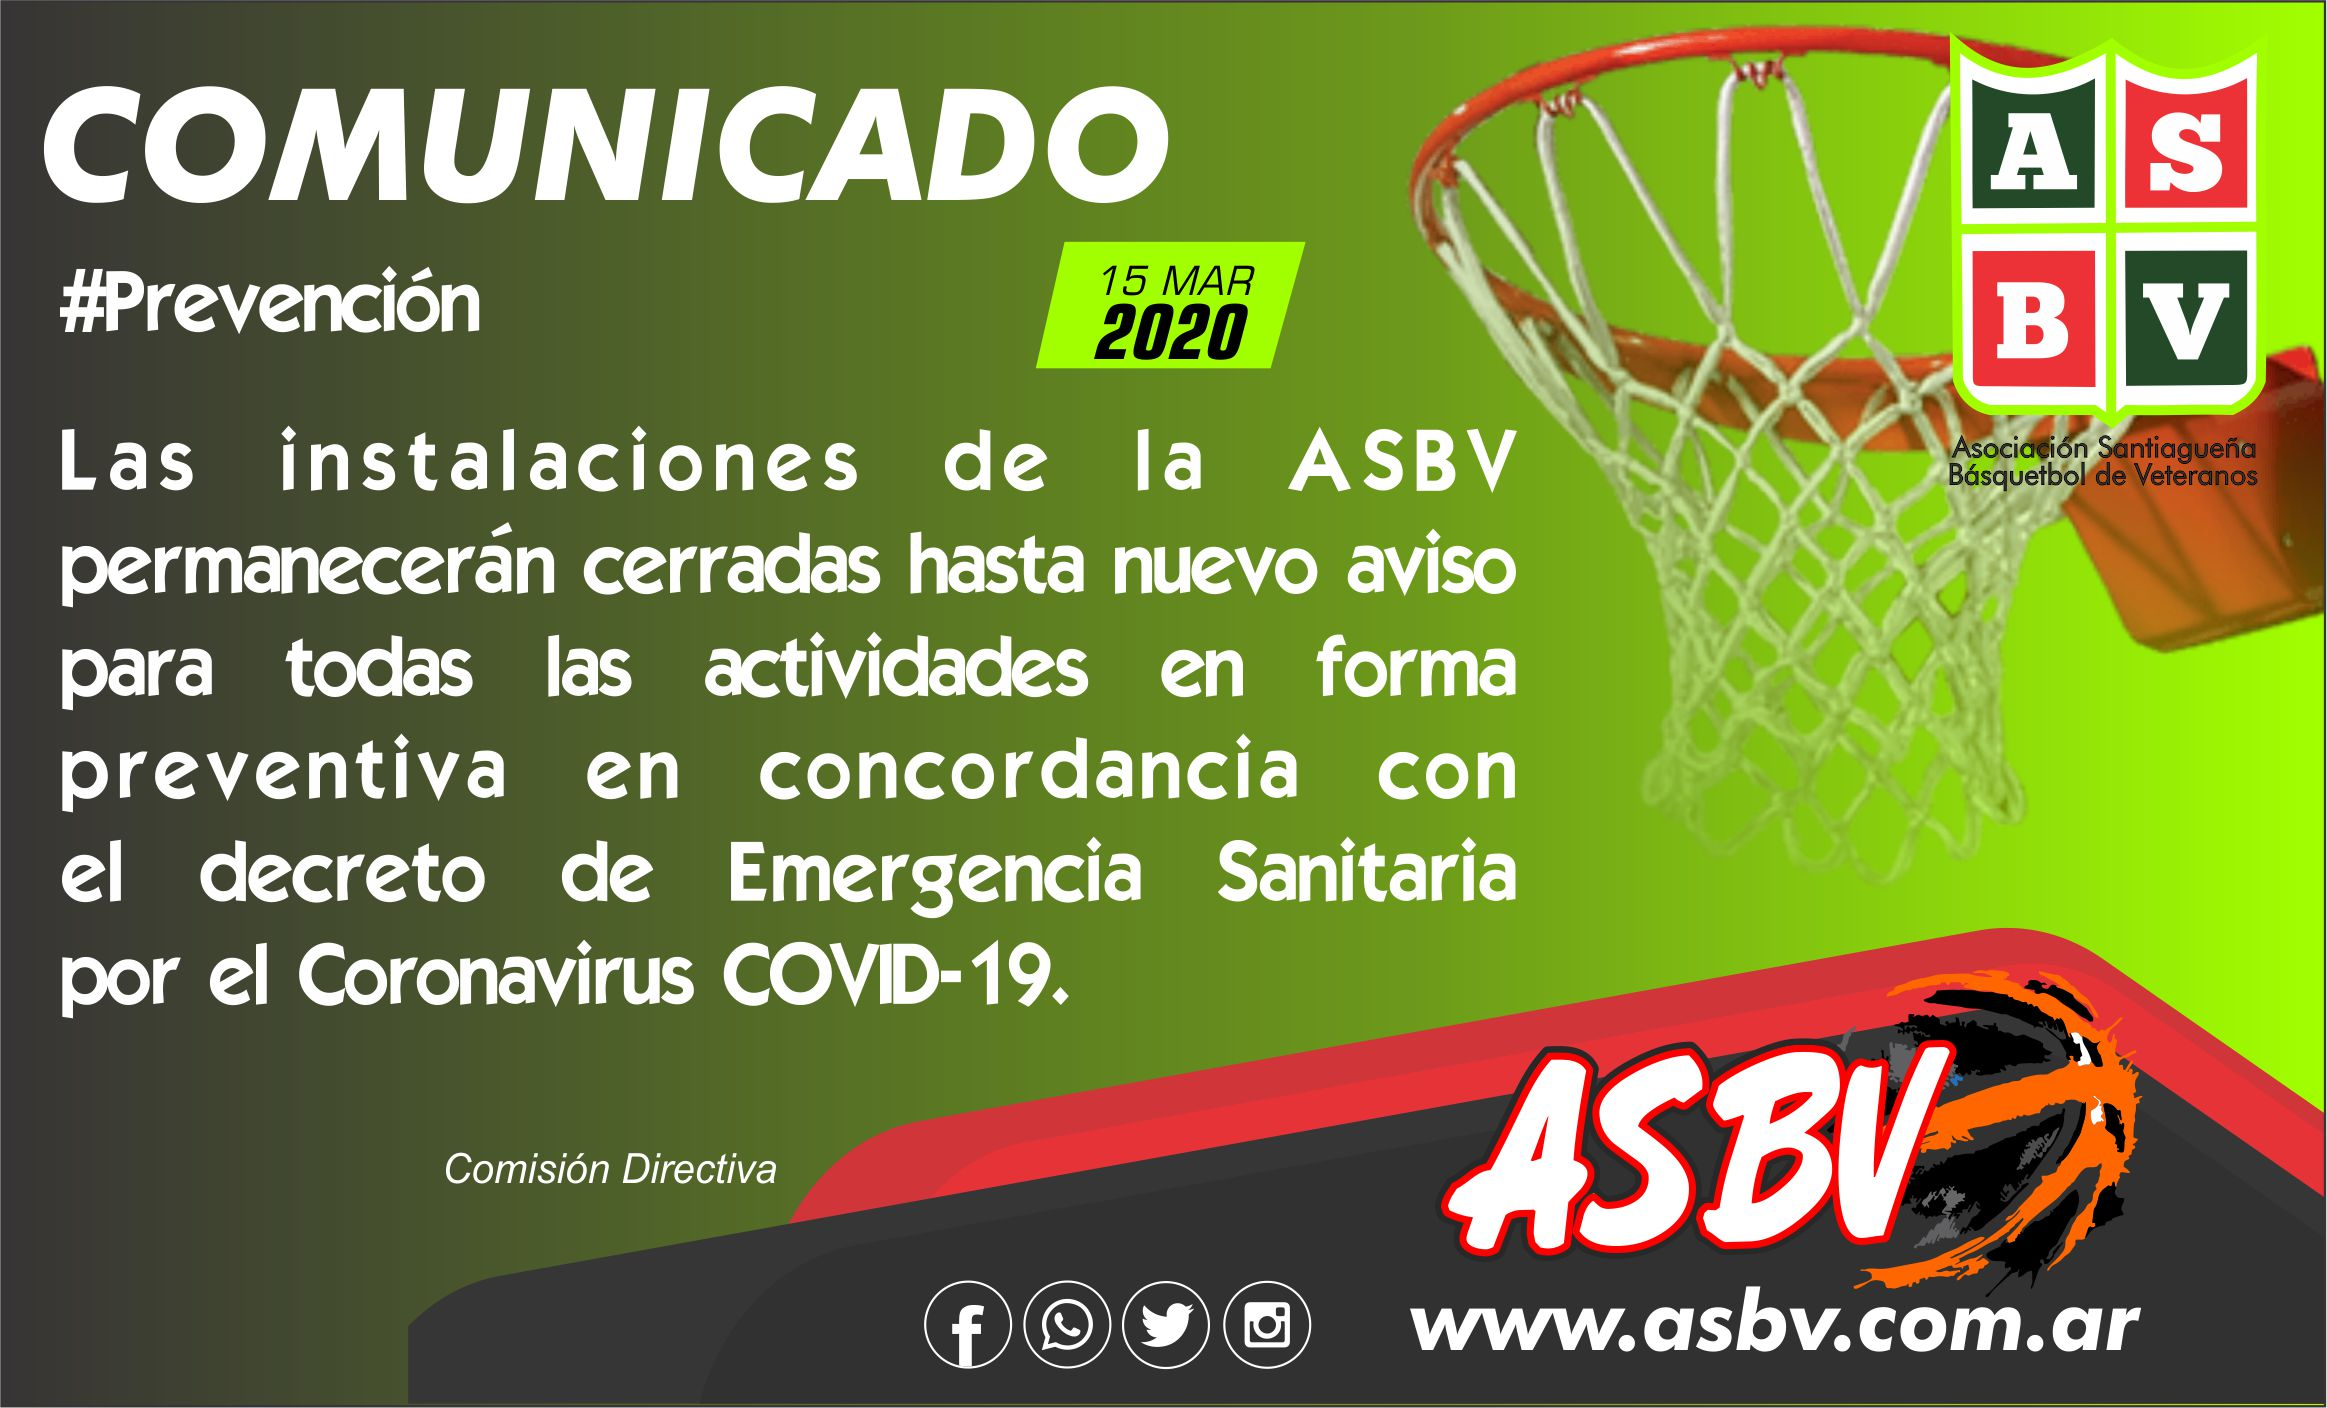 comunicado_15-03-2020_coronavirus